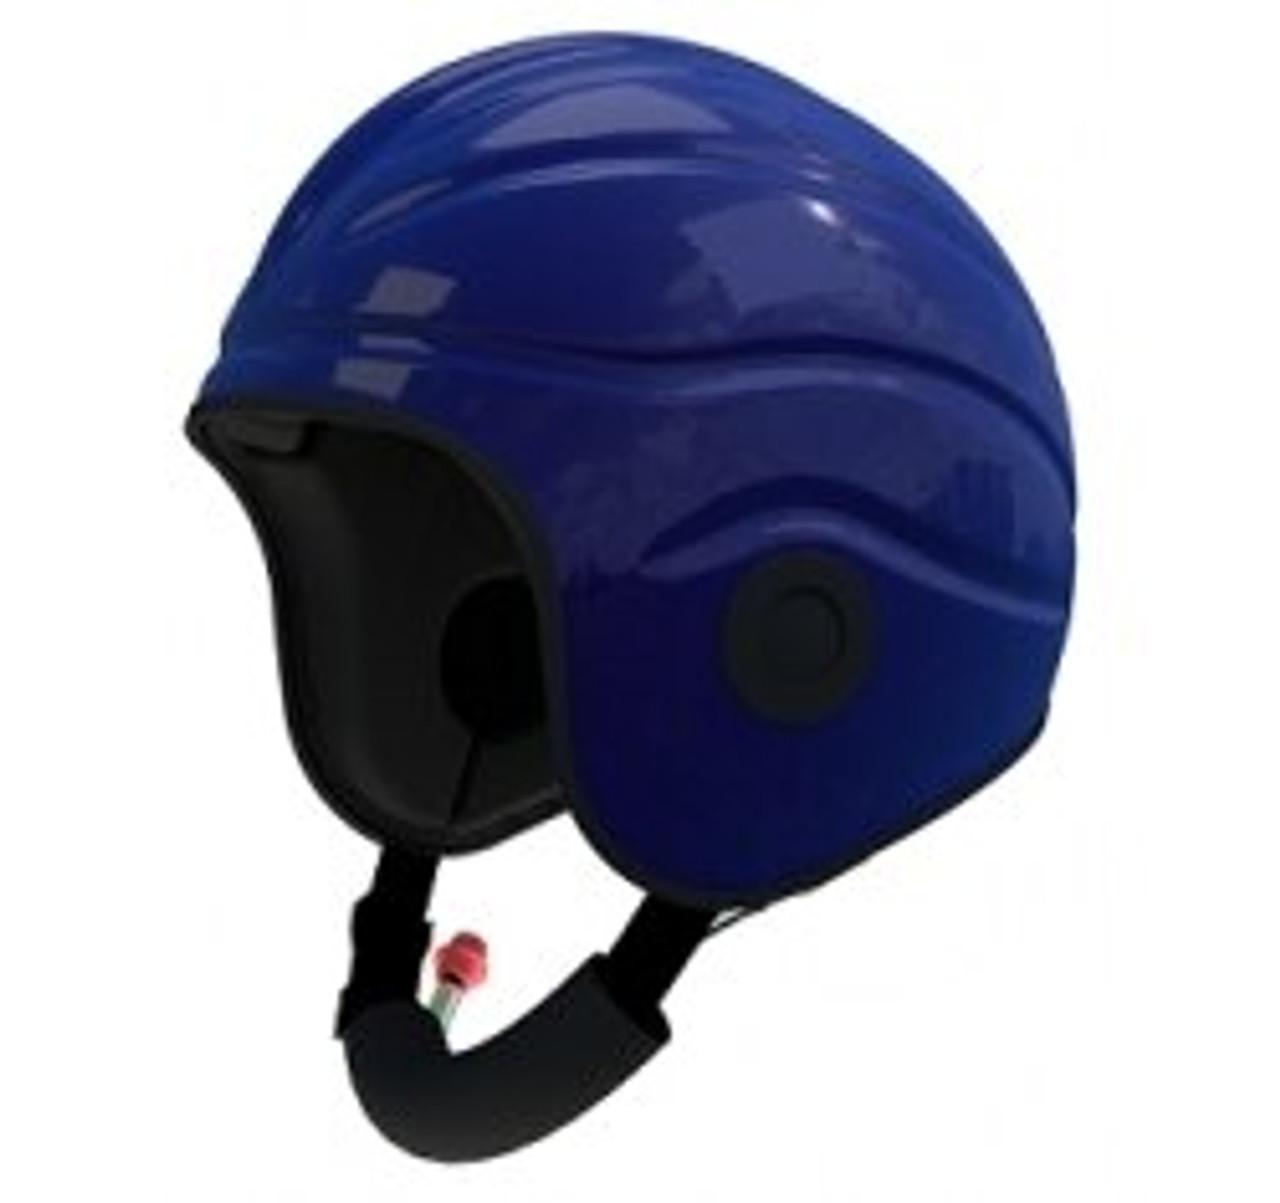 Gecko Marine Safety Helmet - Open Face MK11